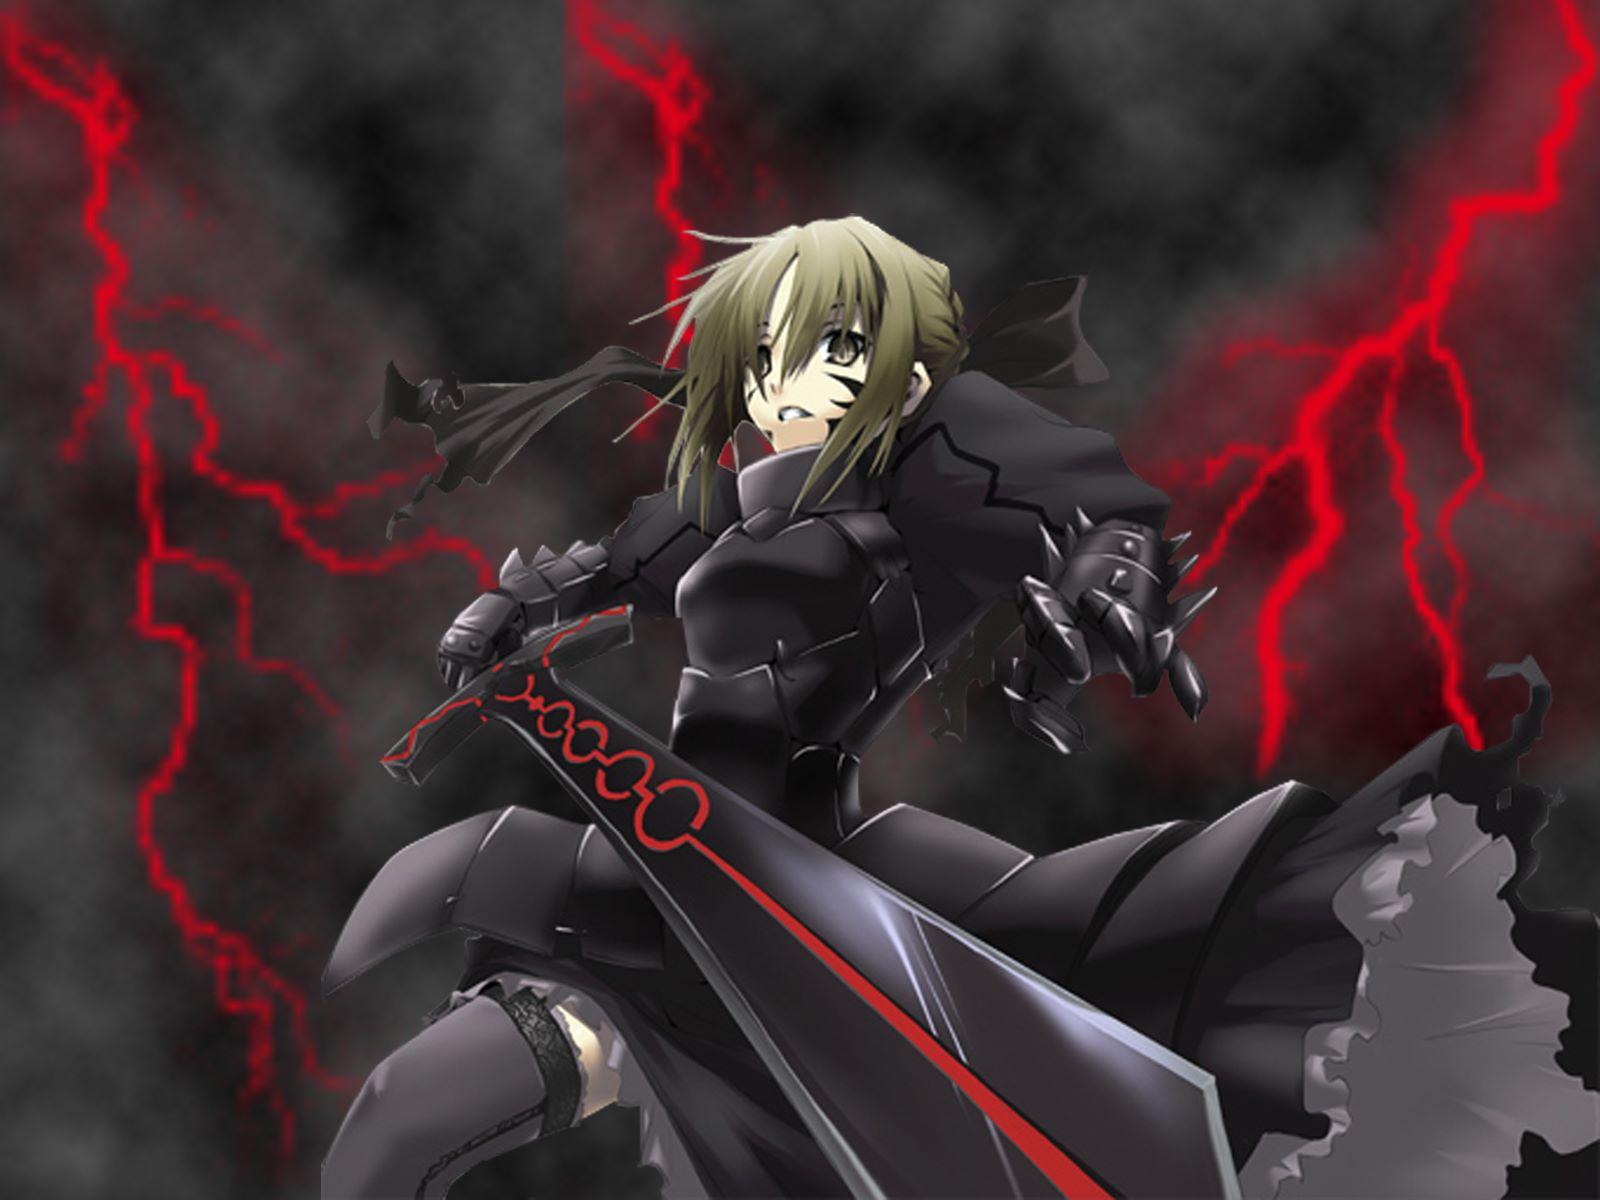 Image Result For Fate Anime K Wallpaper